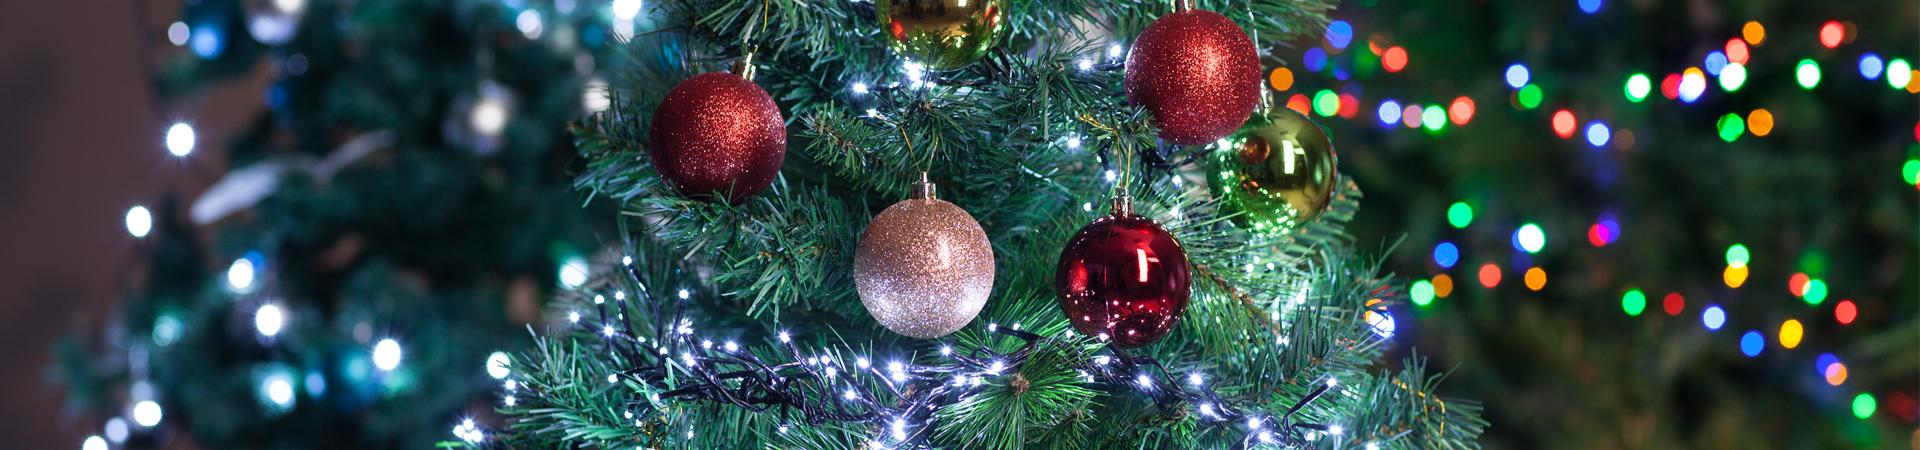 CHRISTMAS_TREE_DECORATIONS